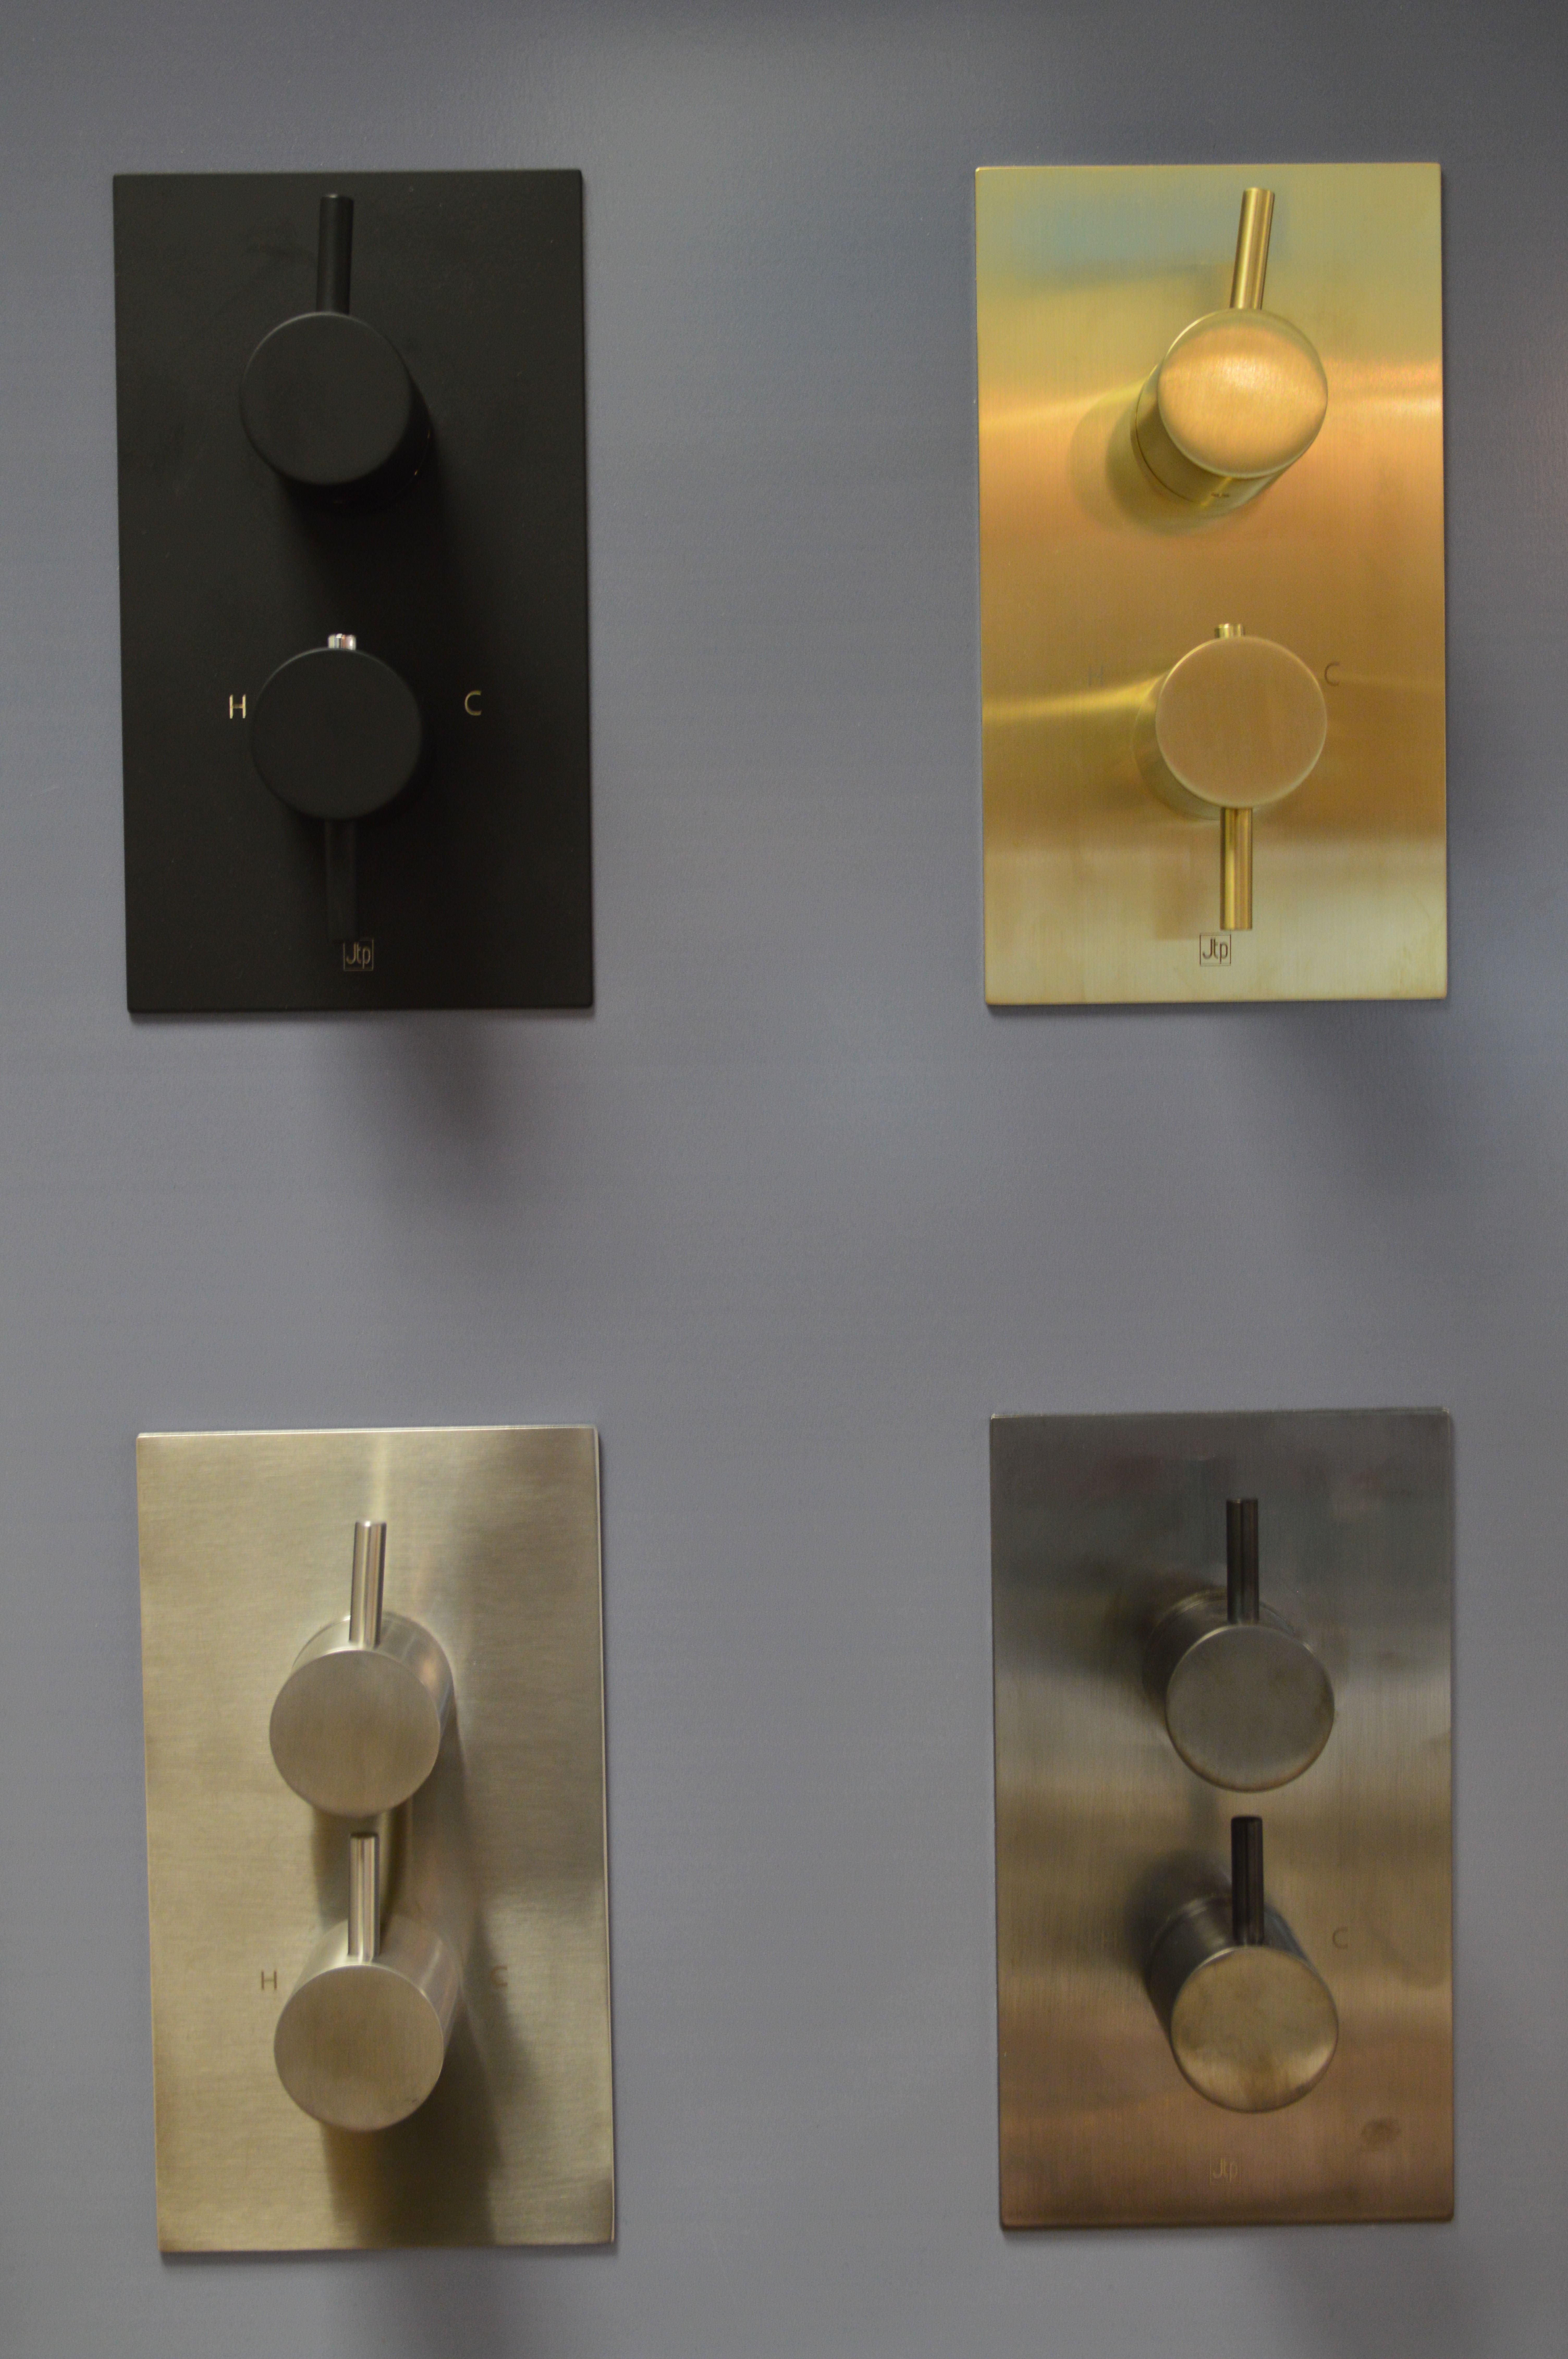 Differing Finishes for Brassware Matt Black, Brushed Brass